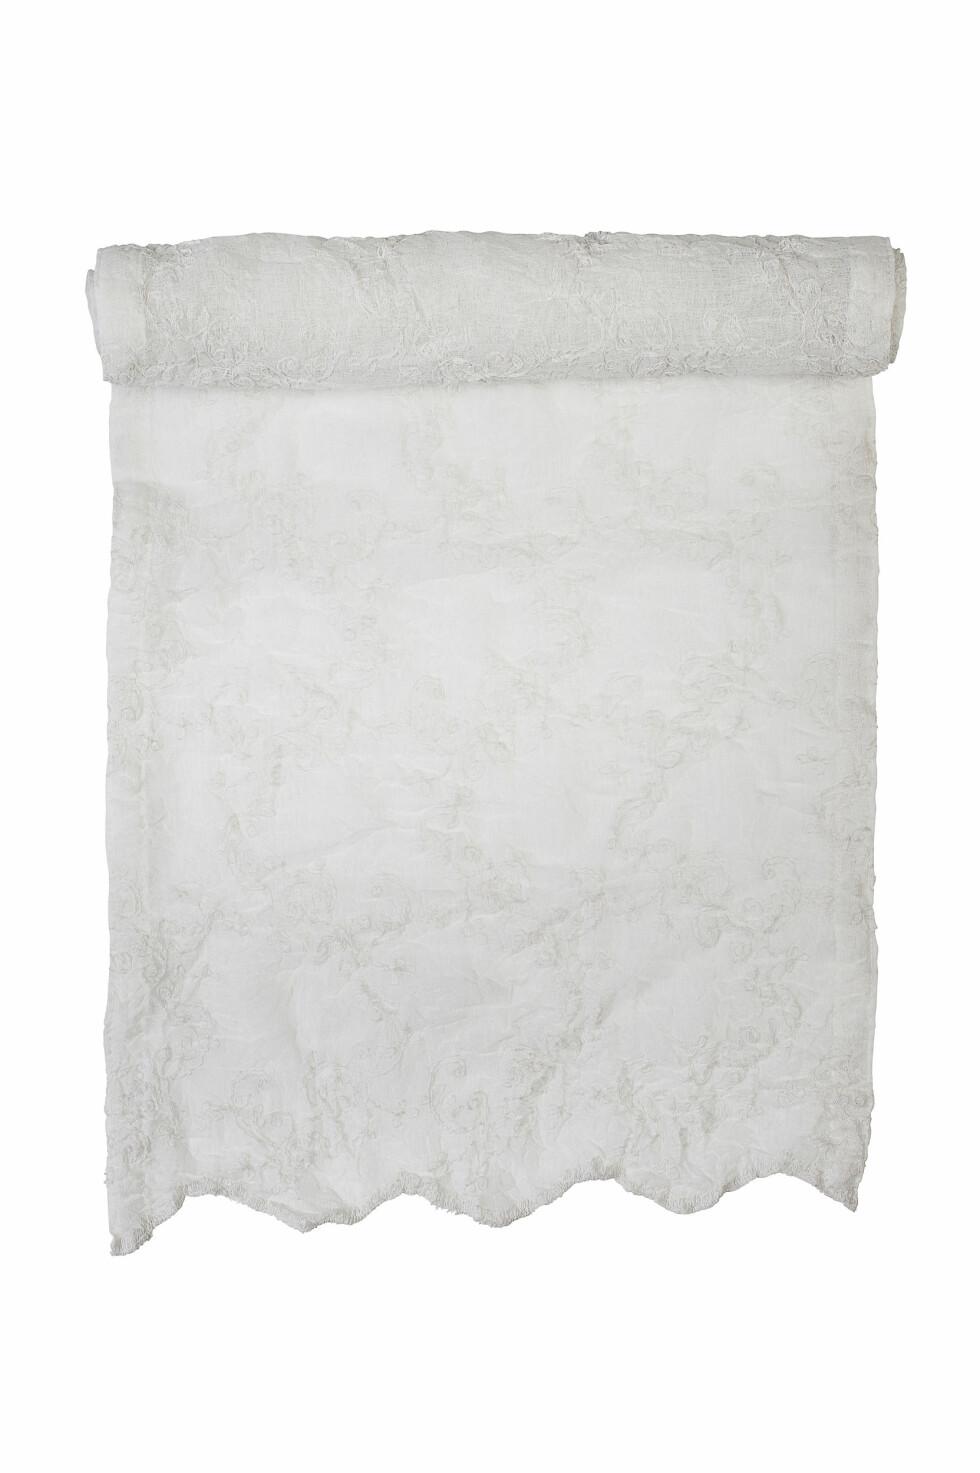 Blondeduk i polyester (kr 150, indiska.no) Foto: Produsenten